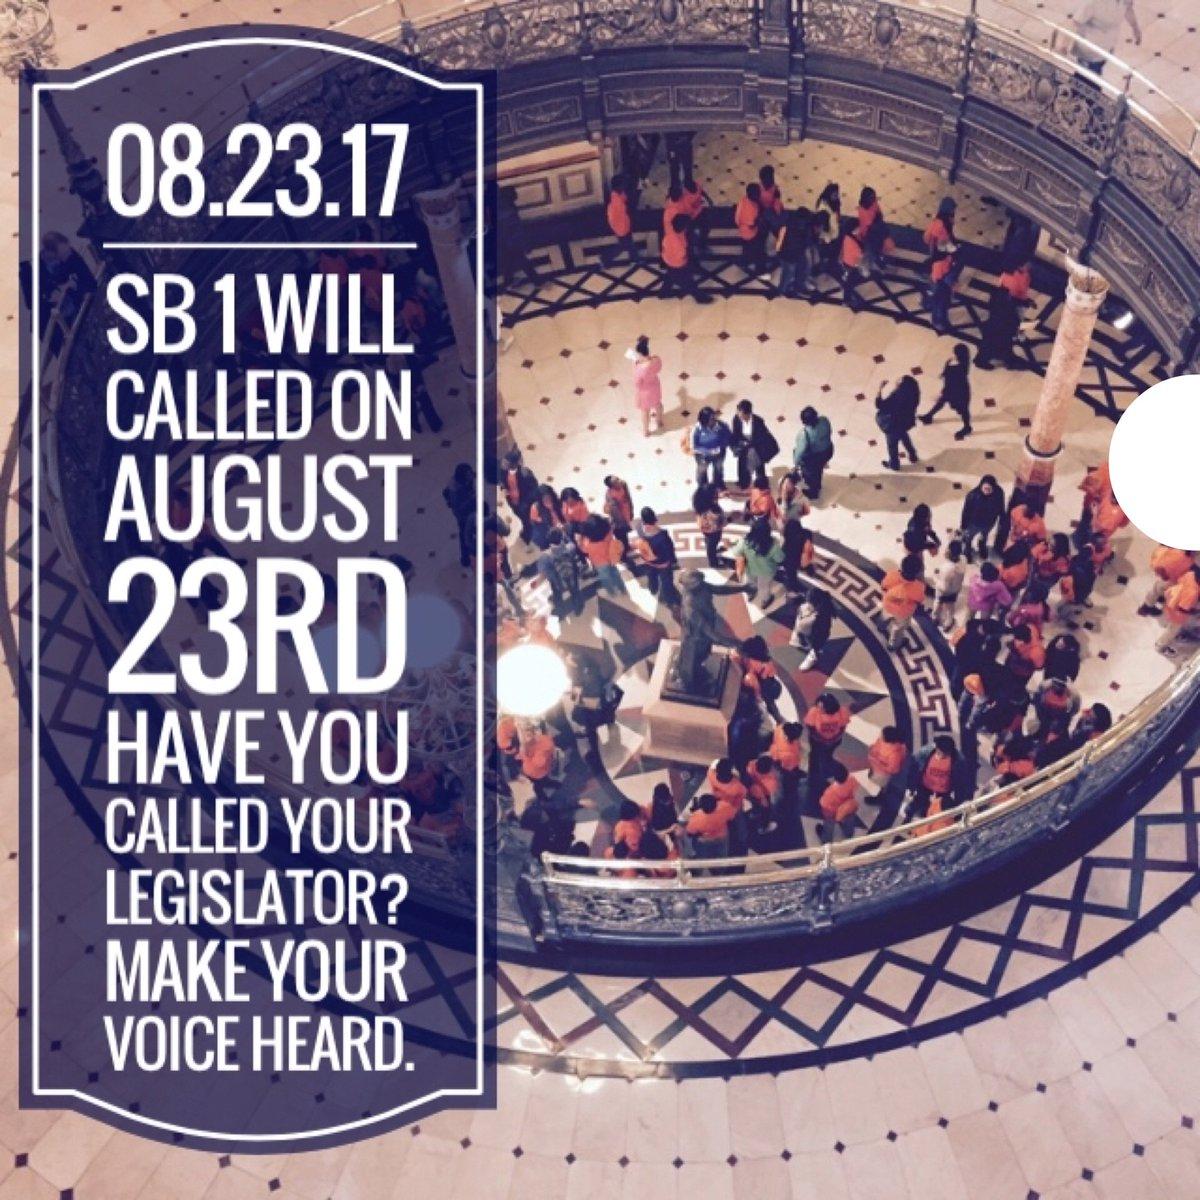 test Twitter Media - Call your legislator and make your voice heard! #fixtheformula #sb1 https://t.co/pV8hSCWbIT